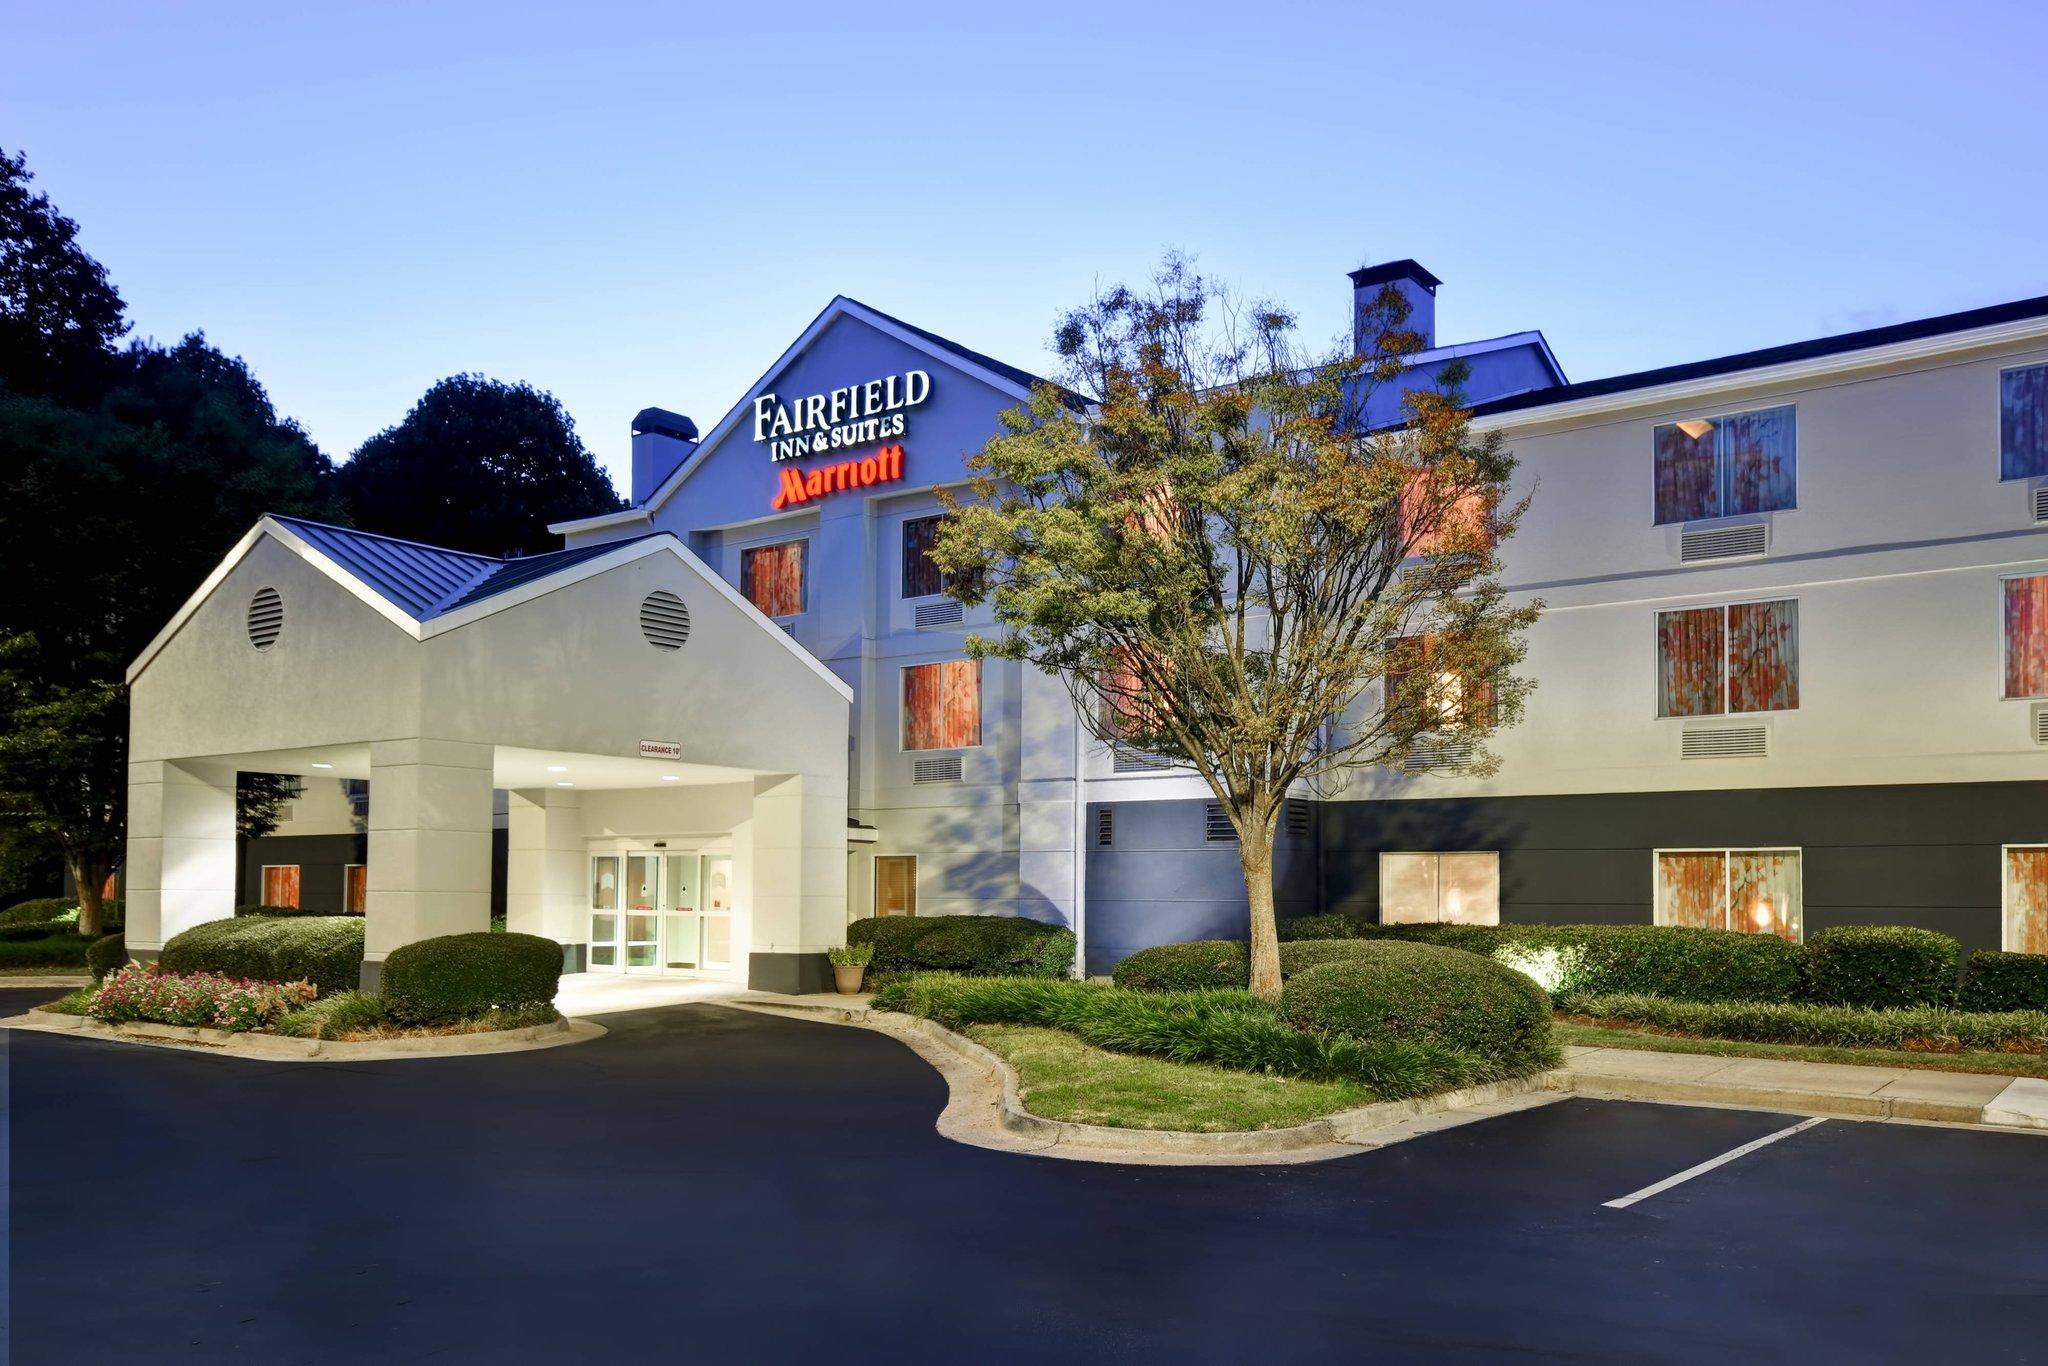 Fairfield Inn and Suites by Marriott Atlanta Kennesaw